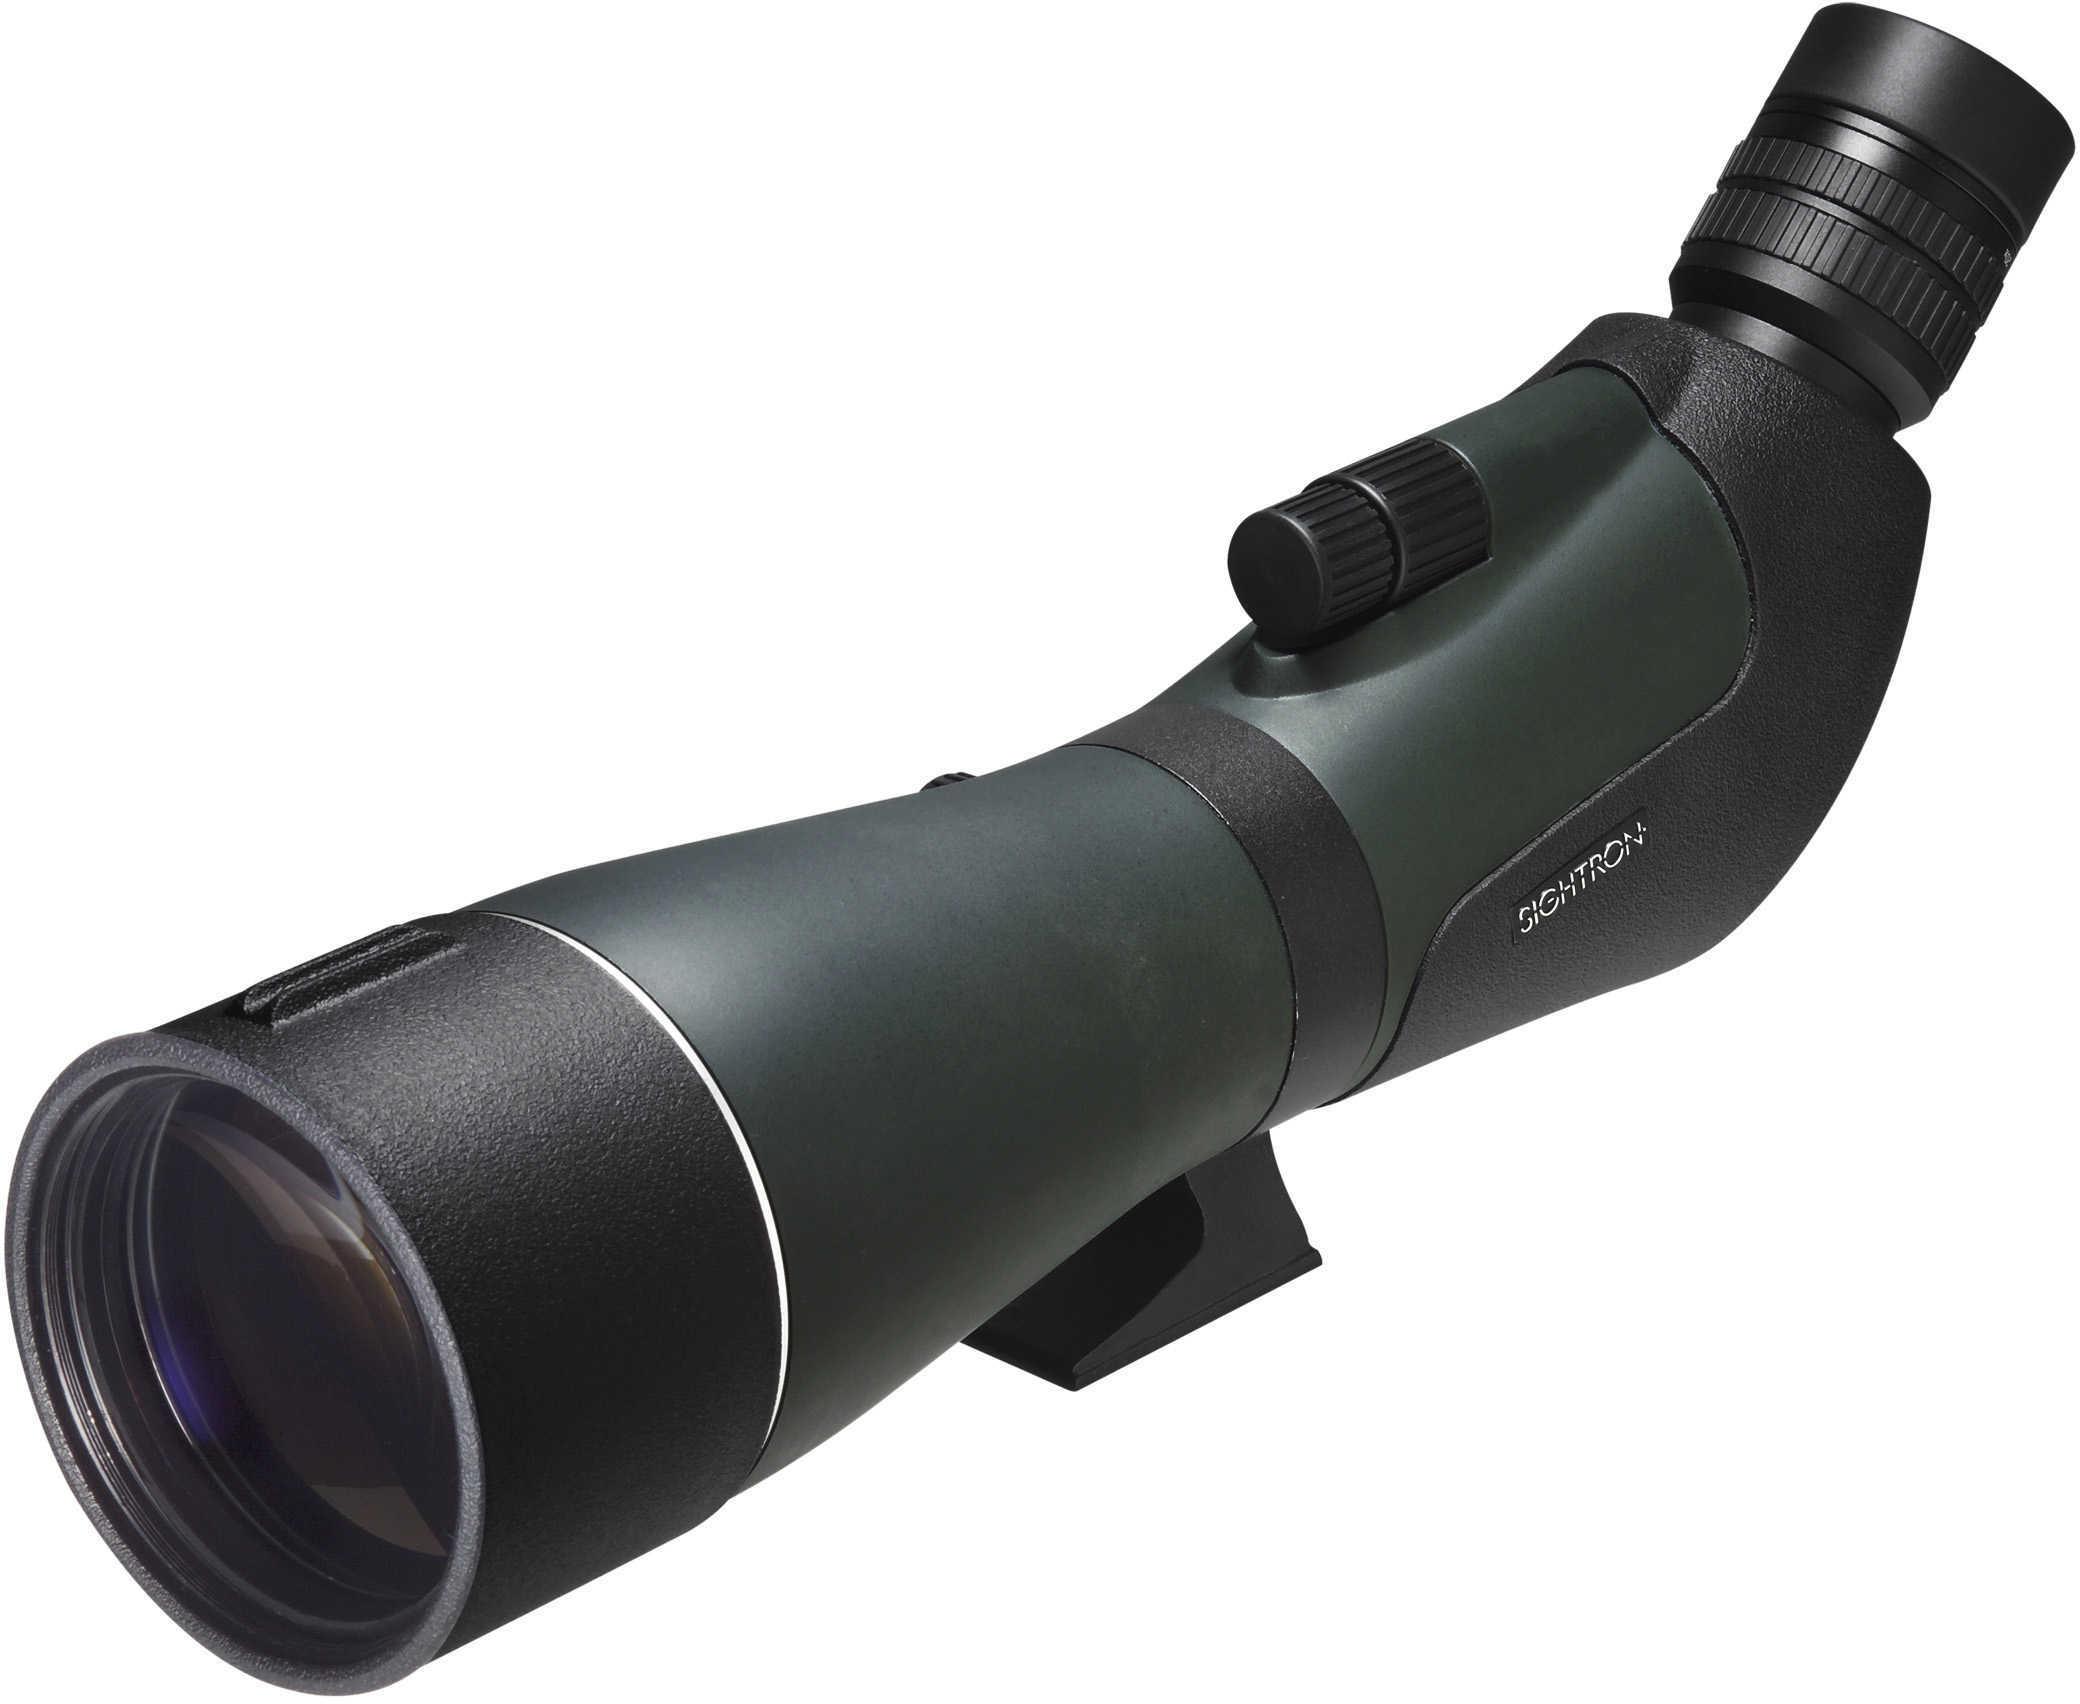 Sightron SII Spotting Scope 20-60X85HD A Md: 23010